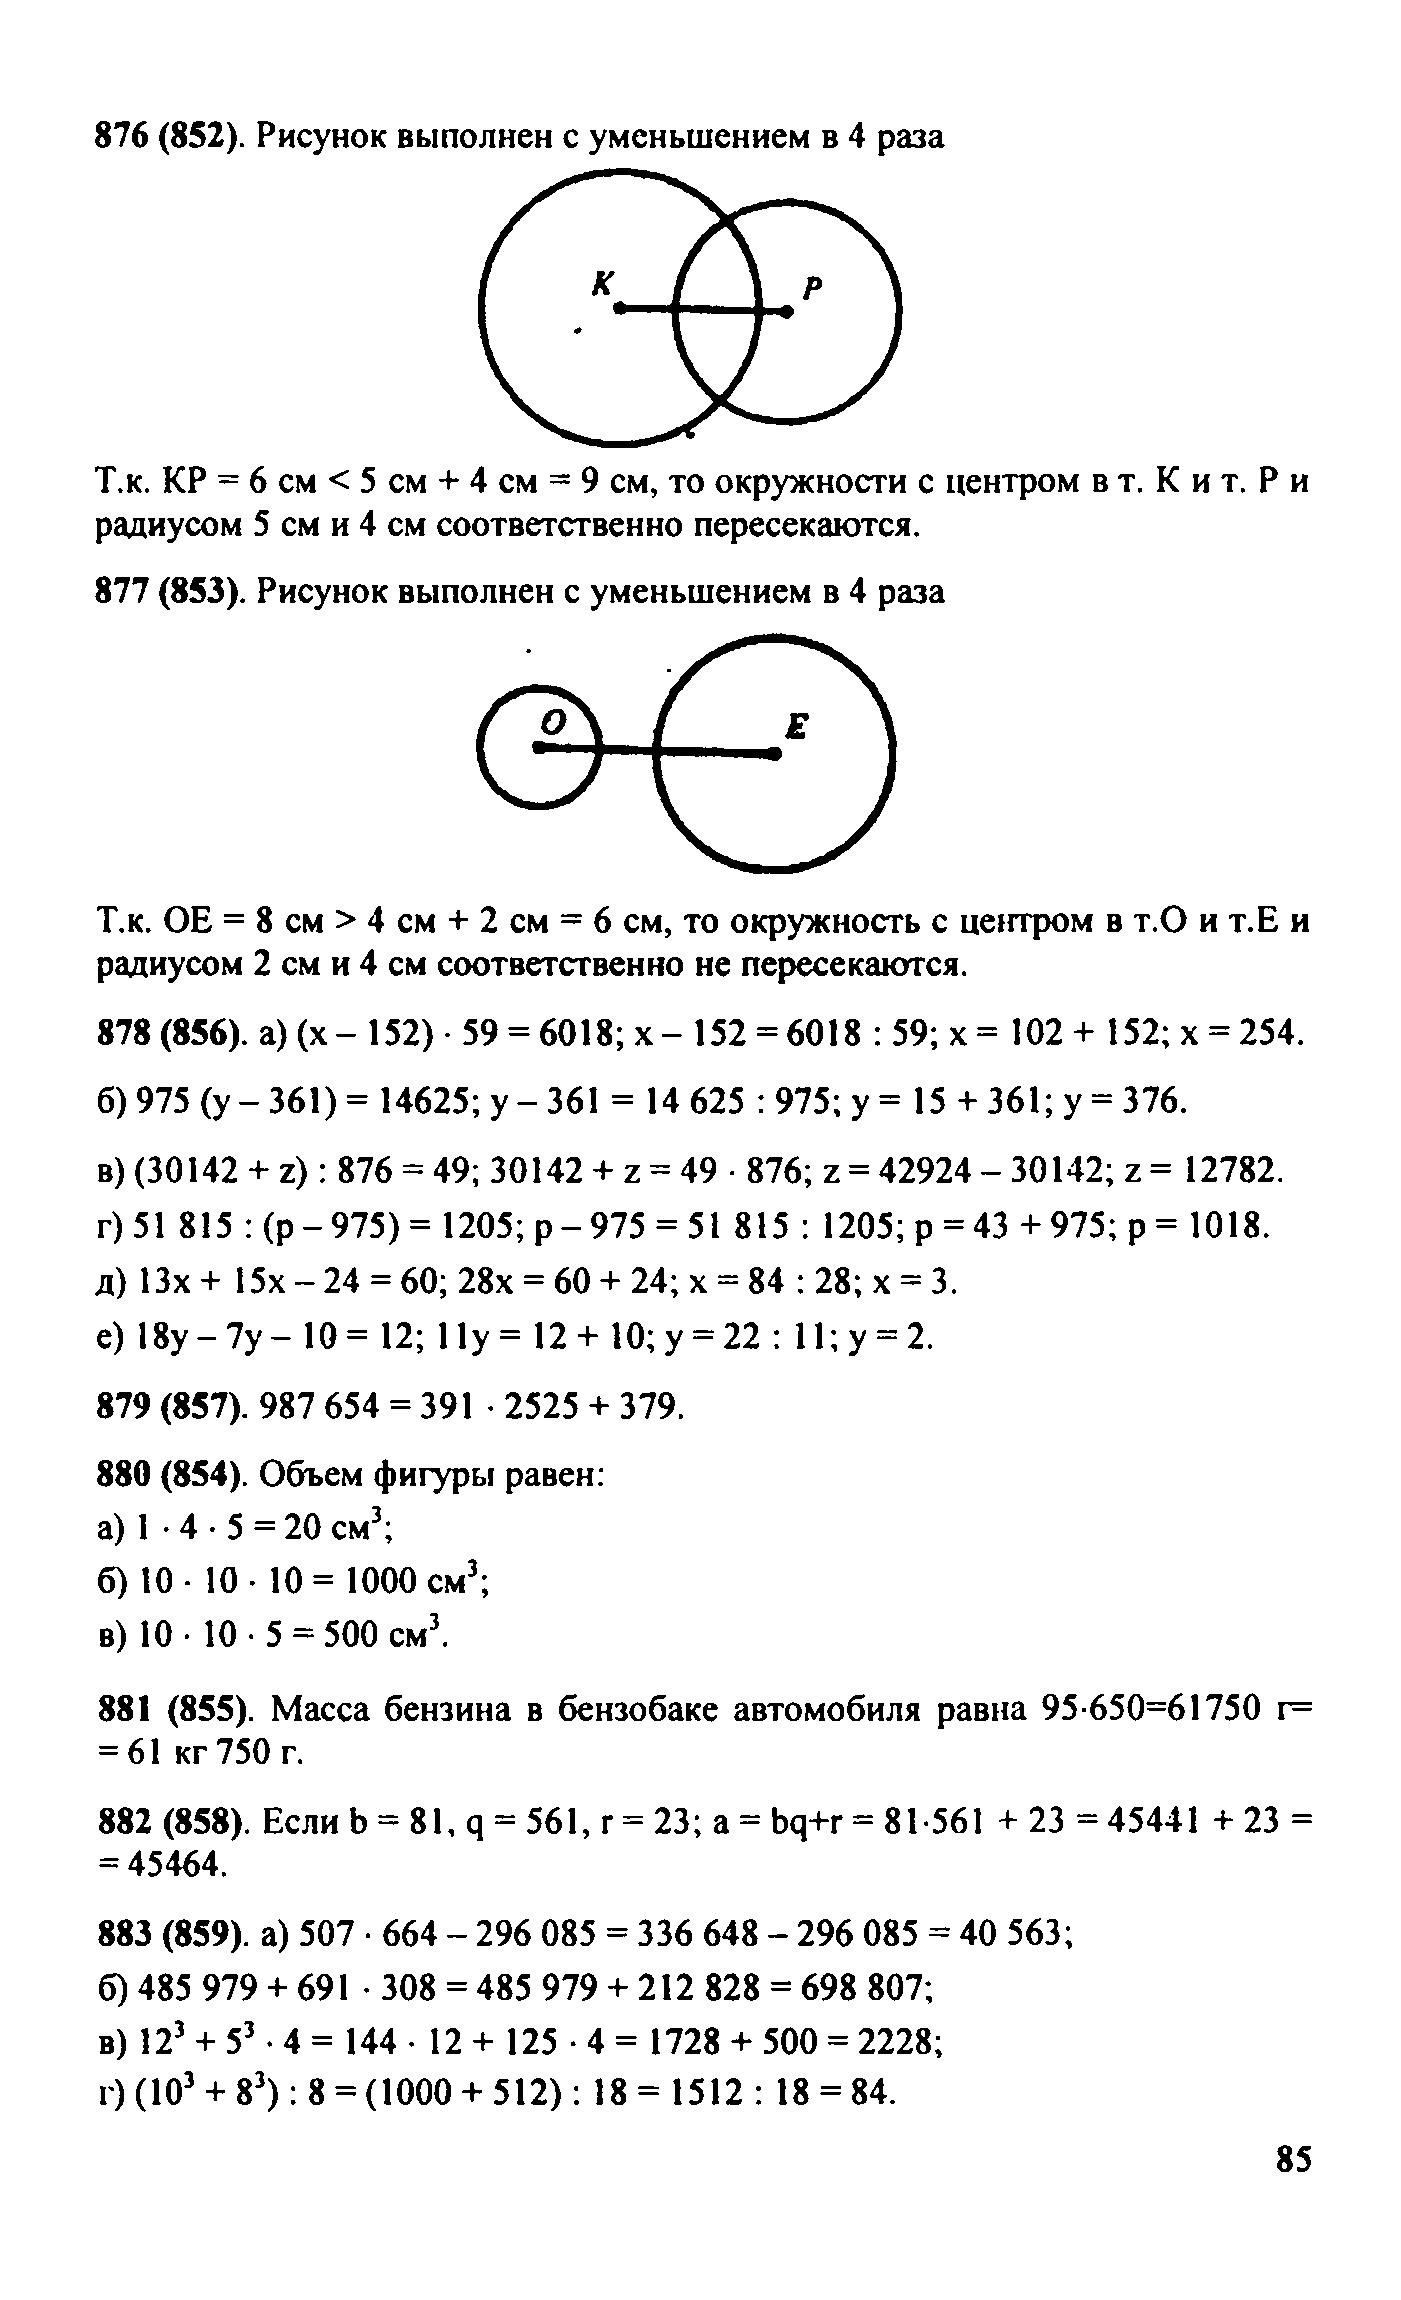 гдз по математике 5 класс виленкин 1999